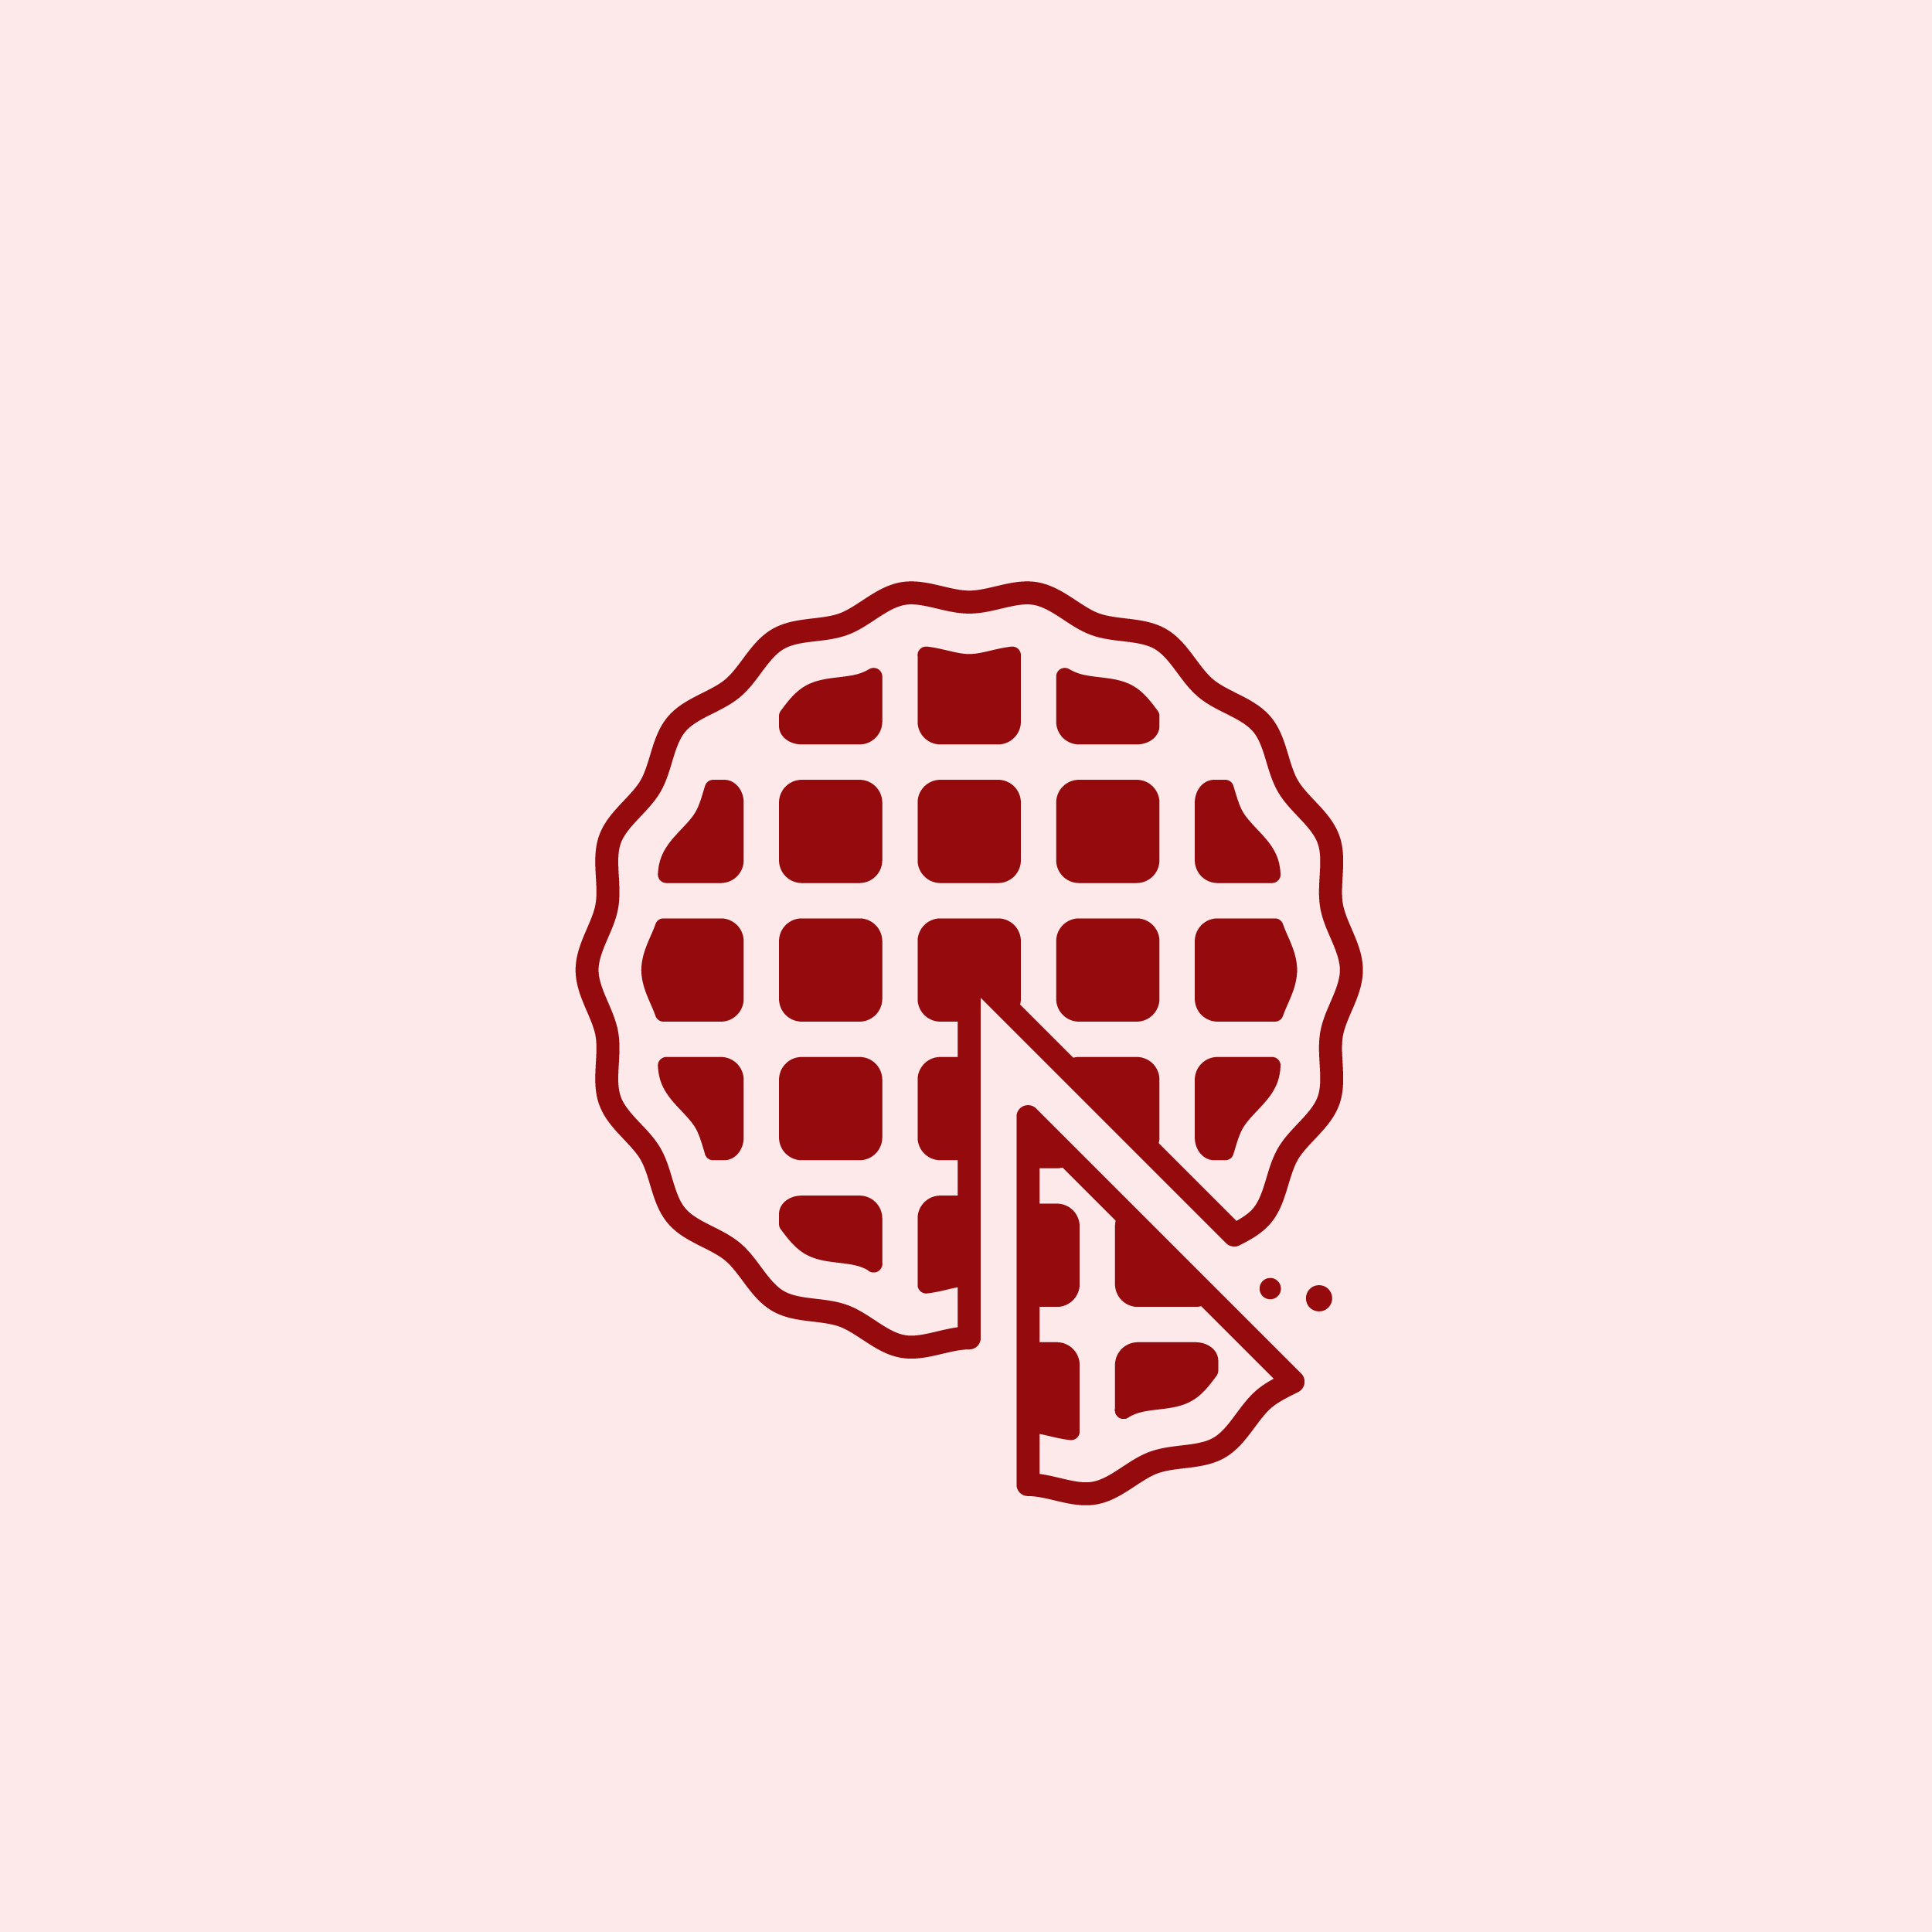 045-cherryPie-45